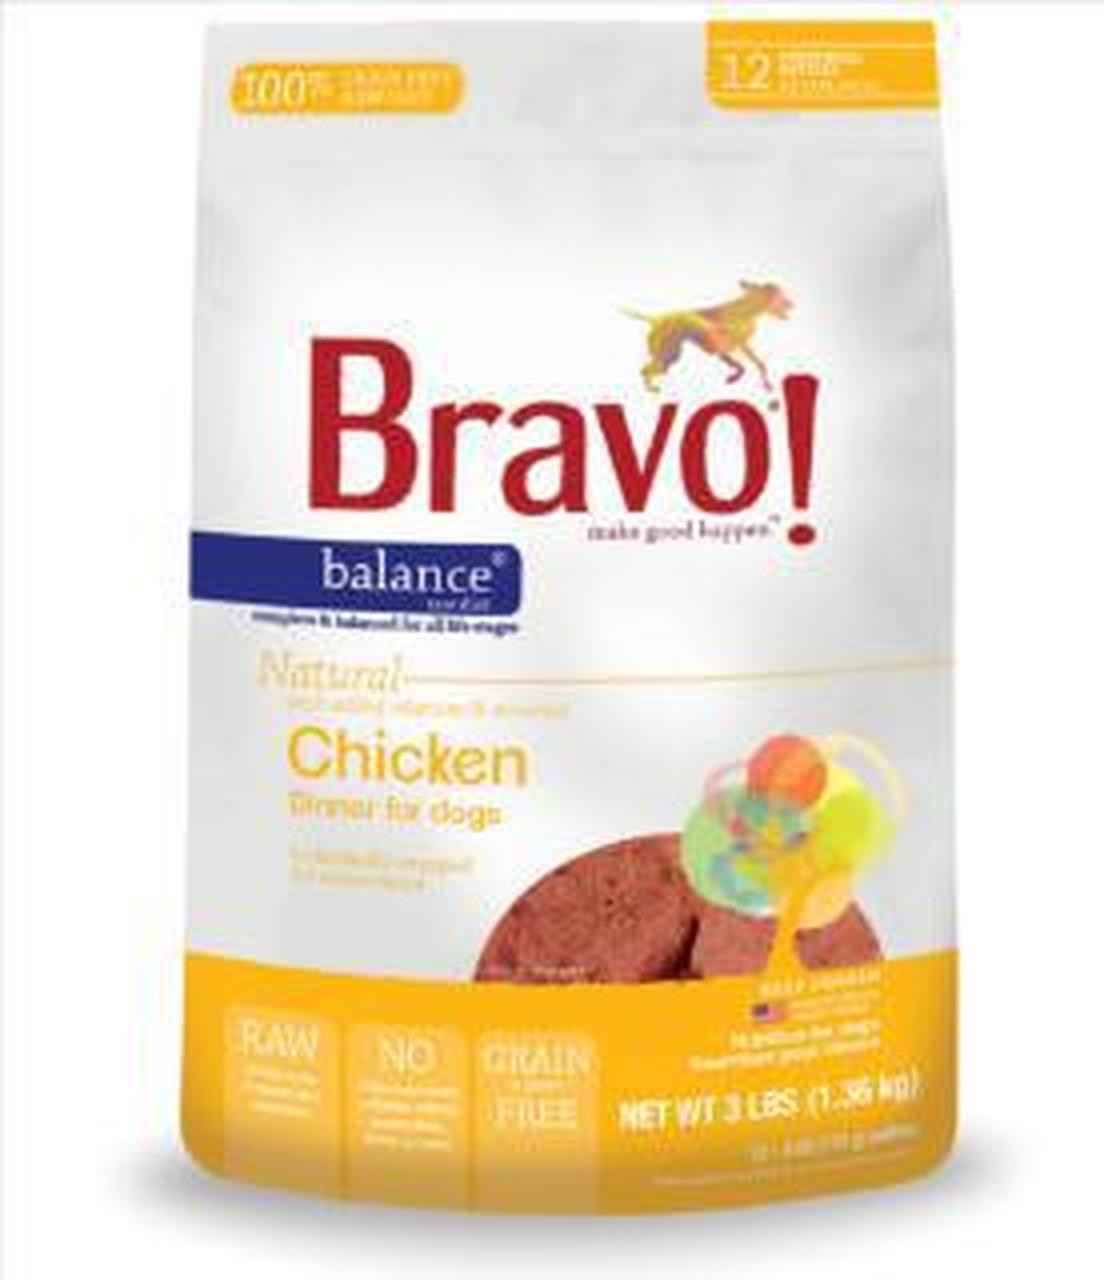 Bravo Balance Chicken Patties Raw Frozen Dog Food Image